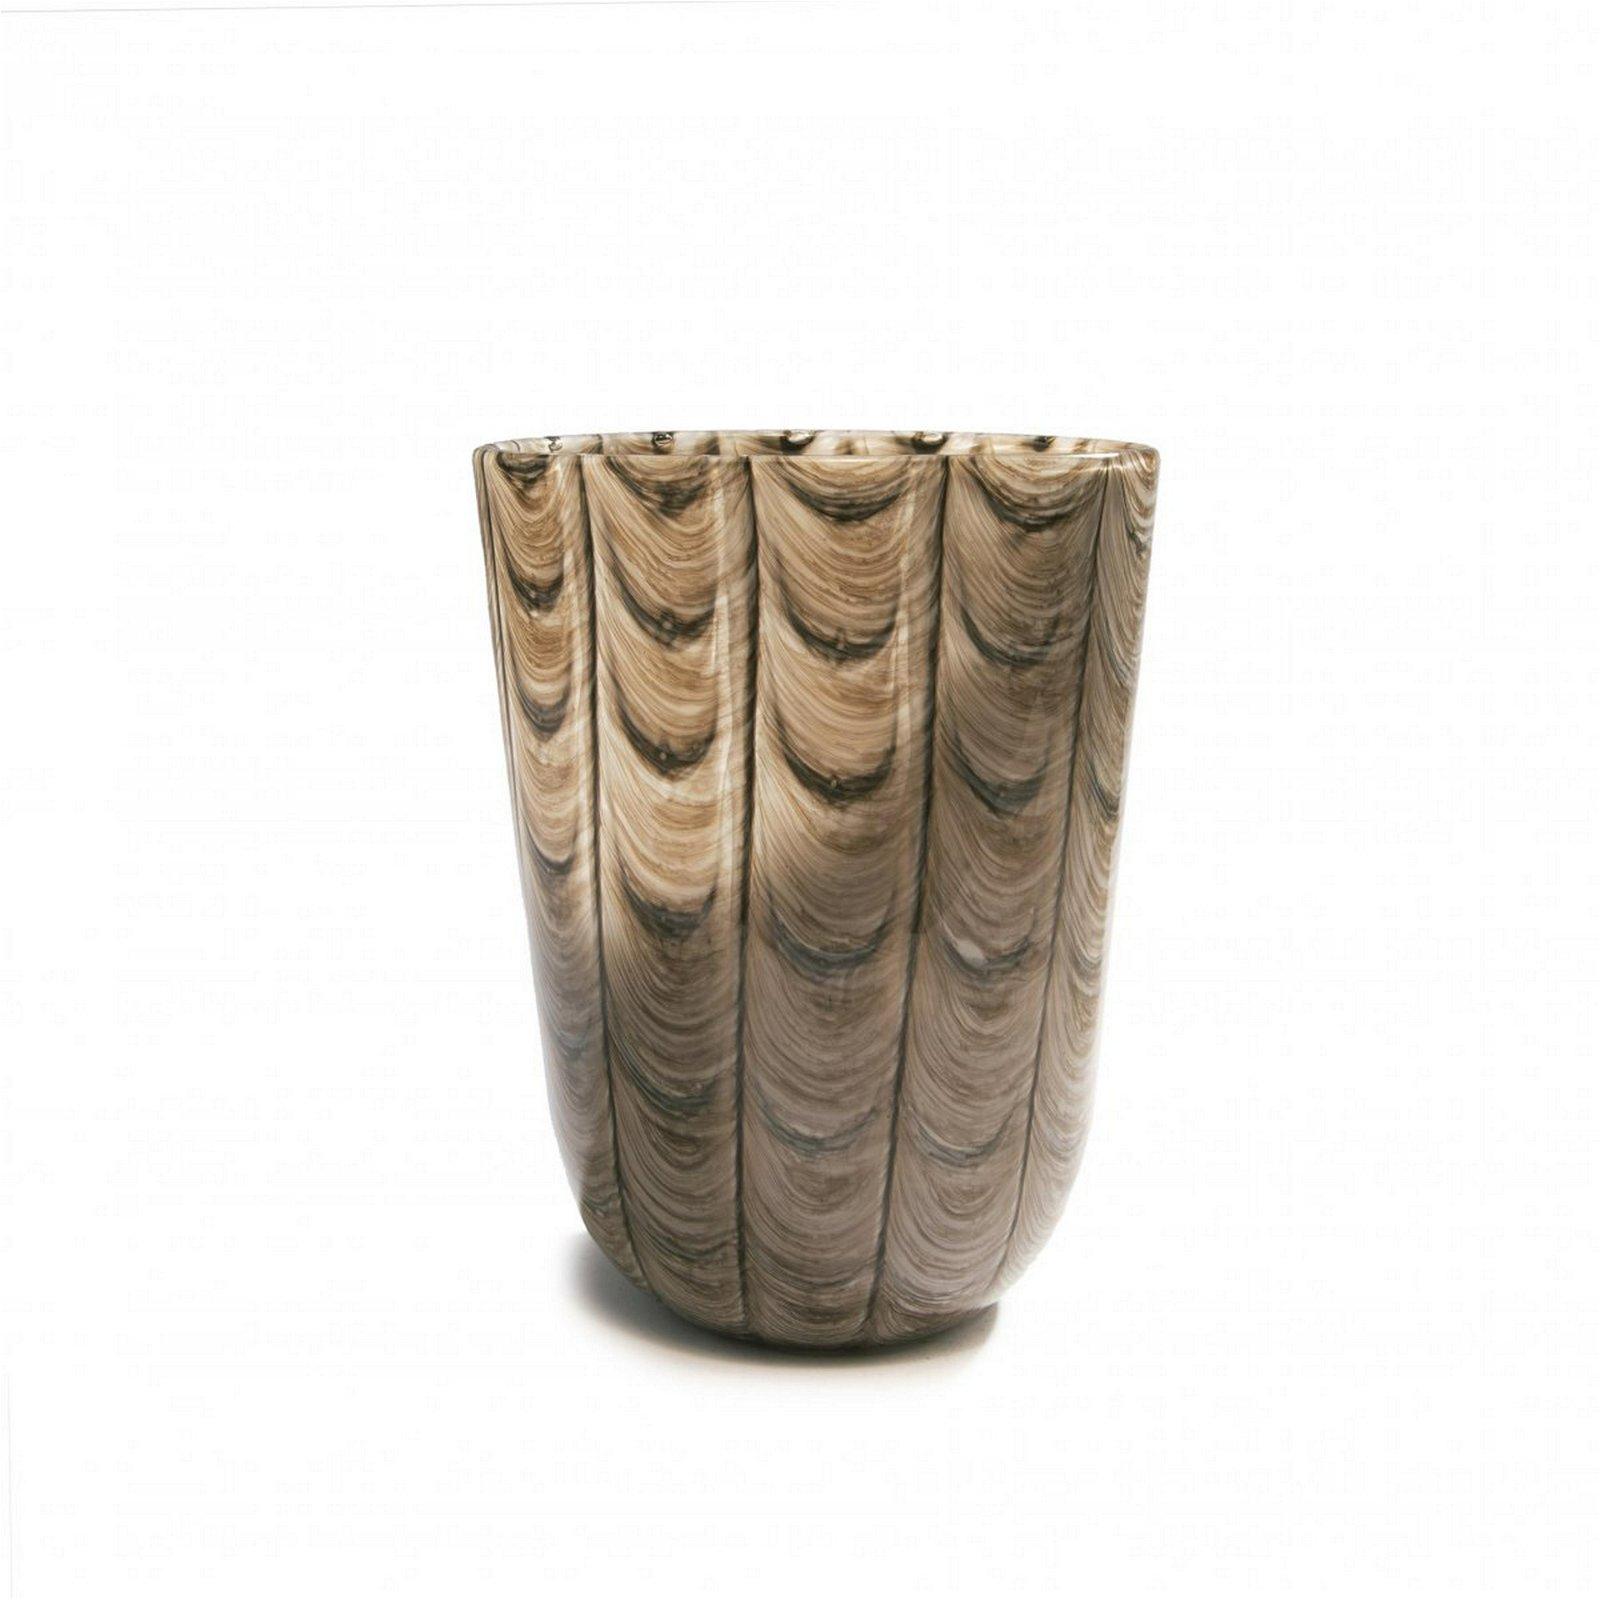 Ercole Barovier, 'Neolitico' vase, 1954